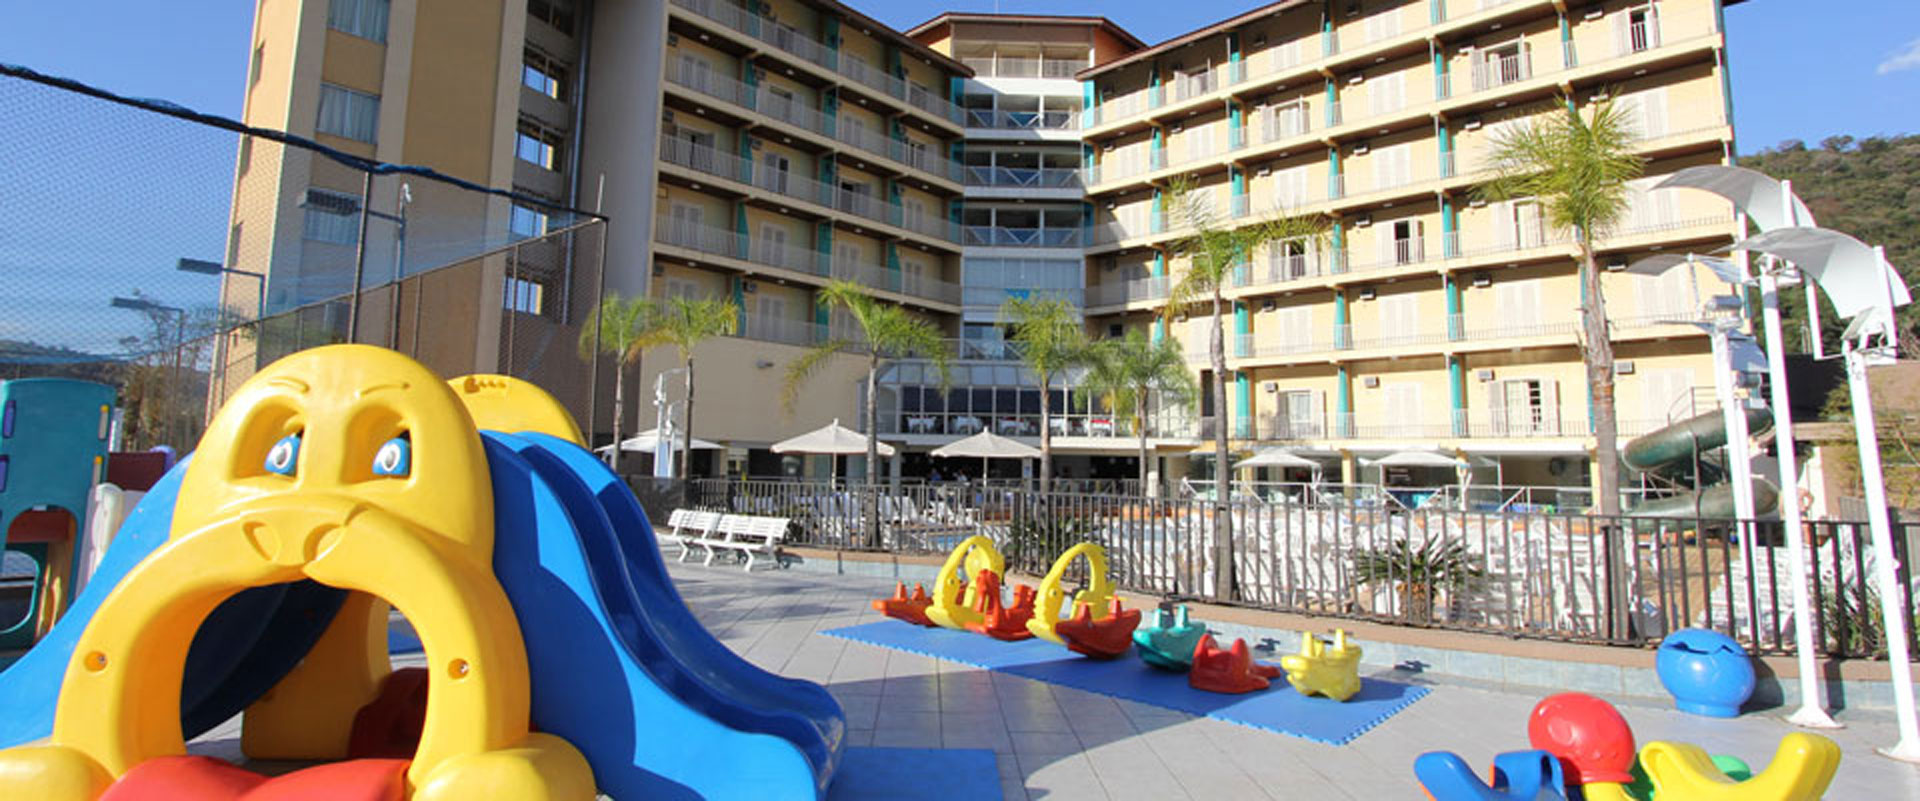 Imagem Hotel Zanon - Fachada